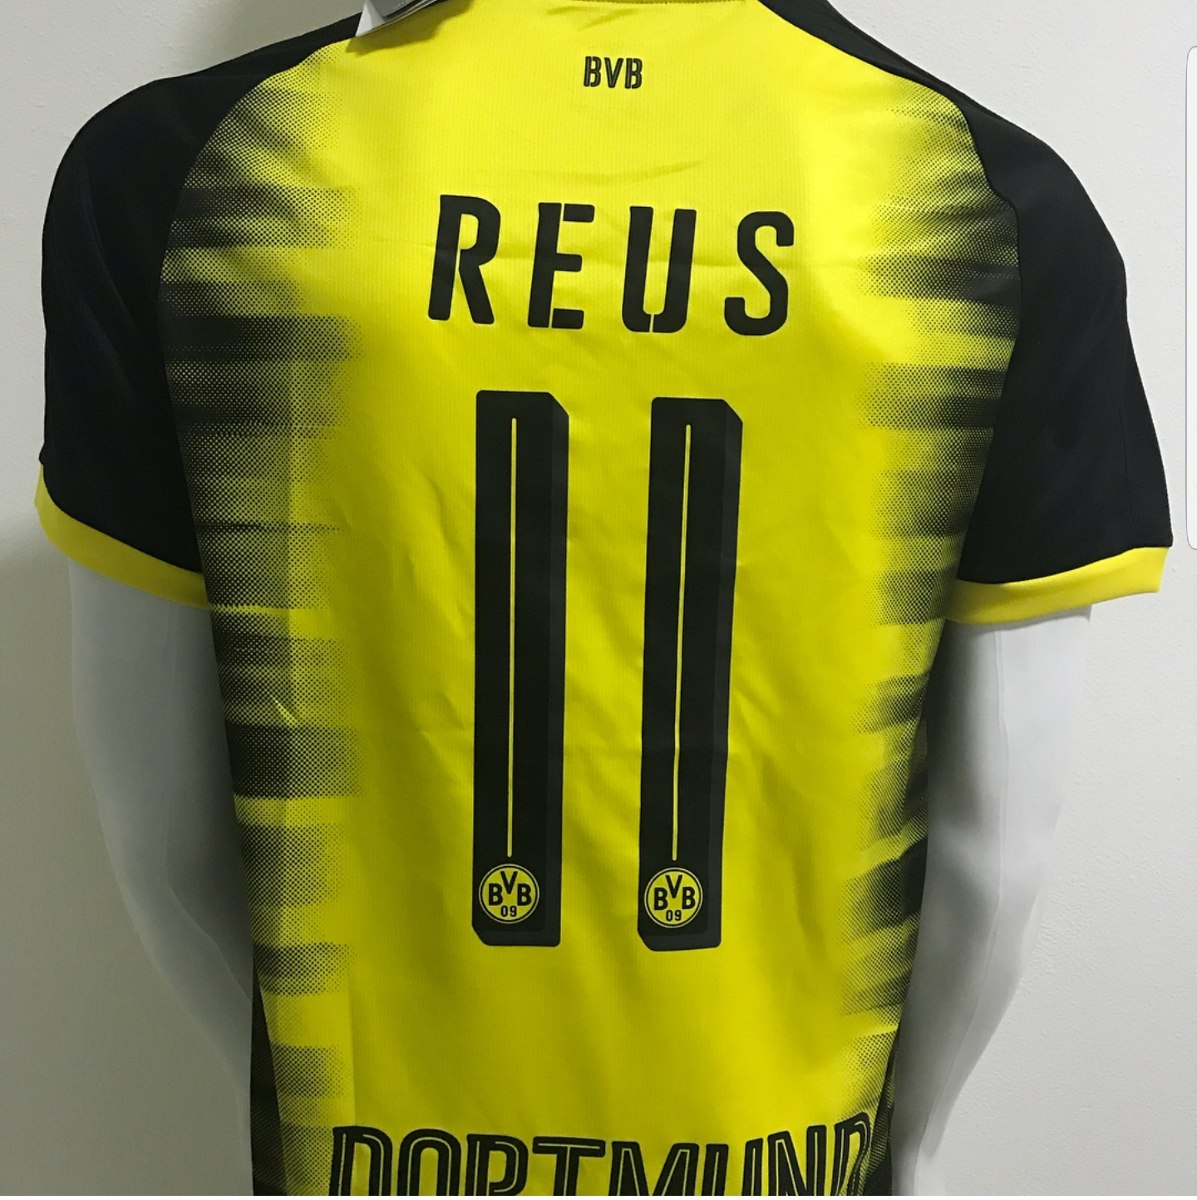 035ff8965 Camisa Borussia Dortmund - Reus 11 - 2017 2018 - R  70